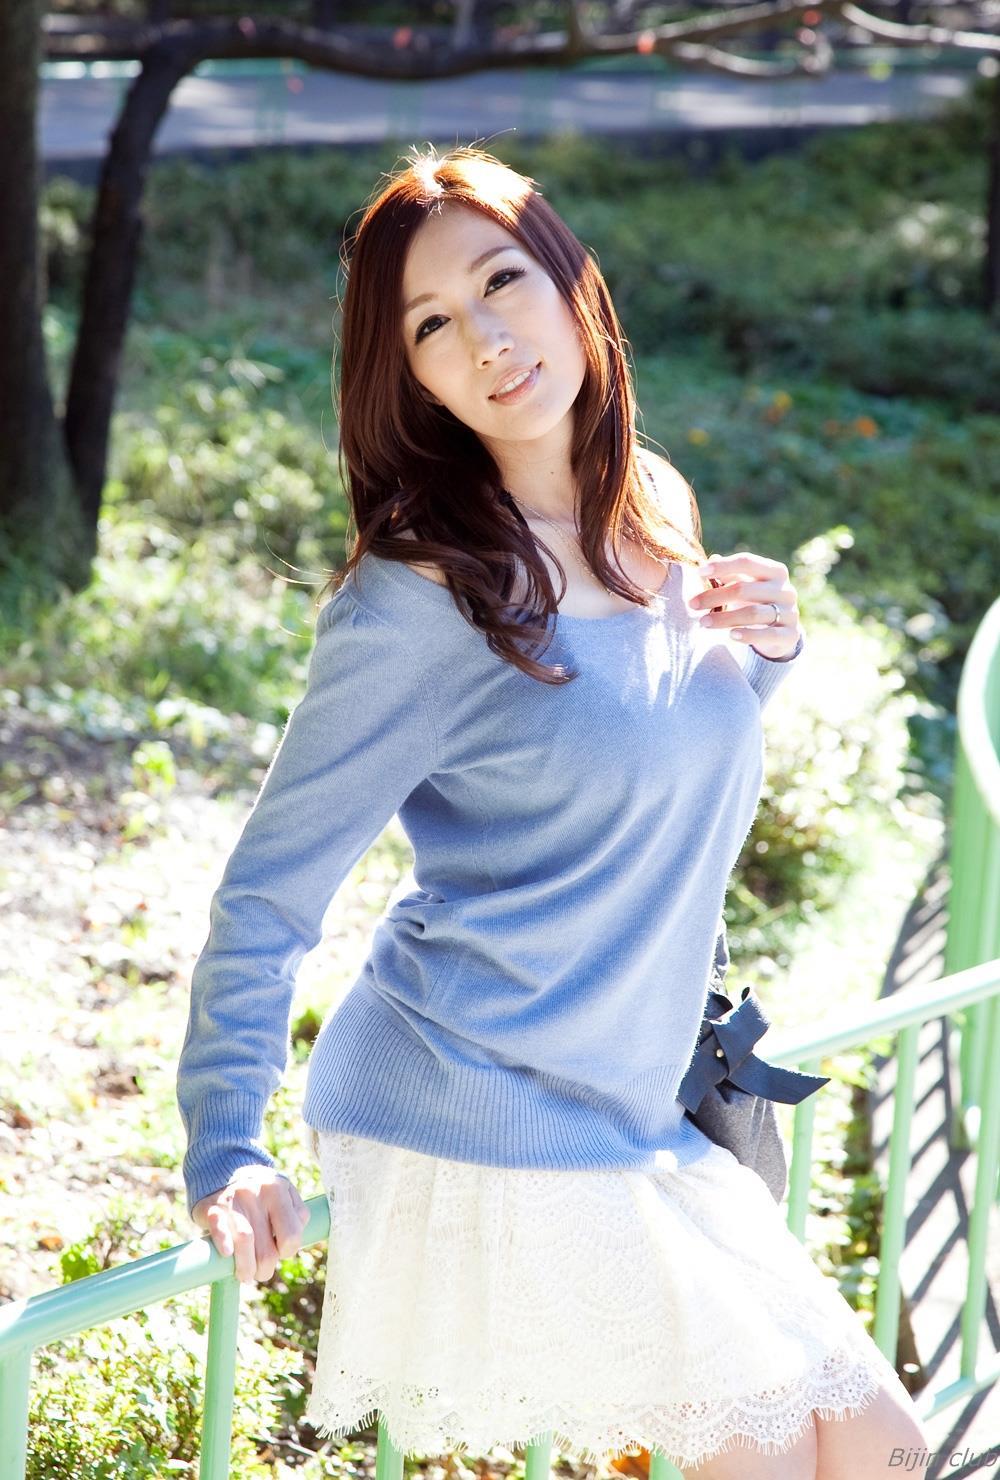 show.jpg4.us jpg4info postto.me MPC-HC AV女優 JULIA